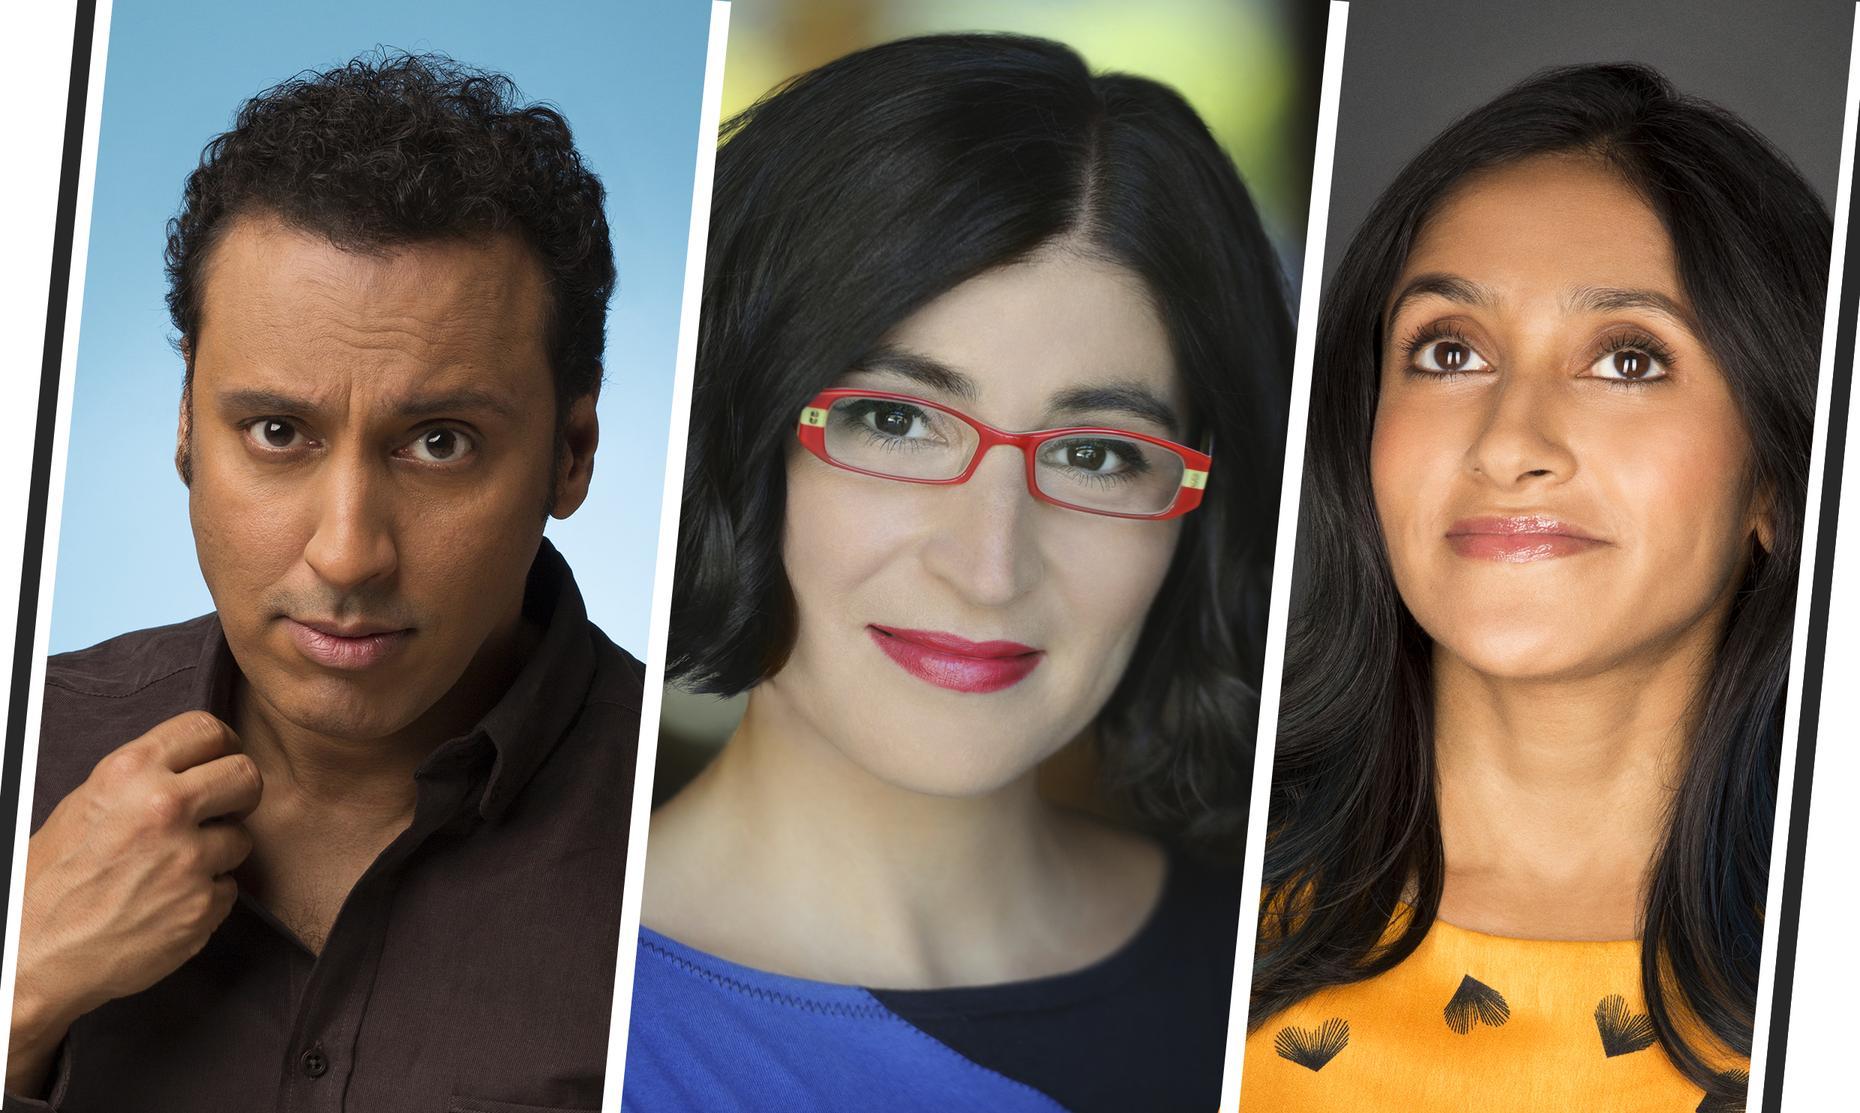 Fake the Nation Live with Negin Farsad, Aasif Mandvi and Aparna Nancherla